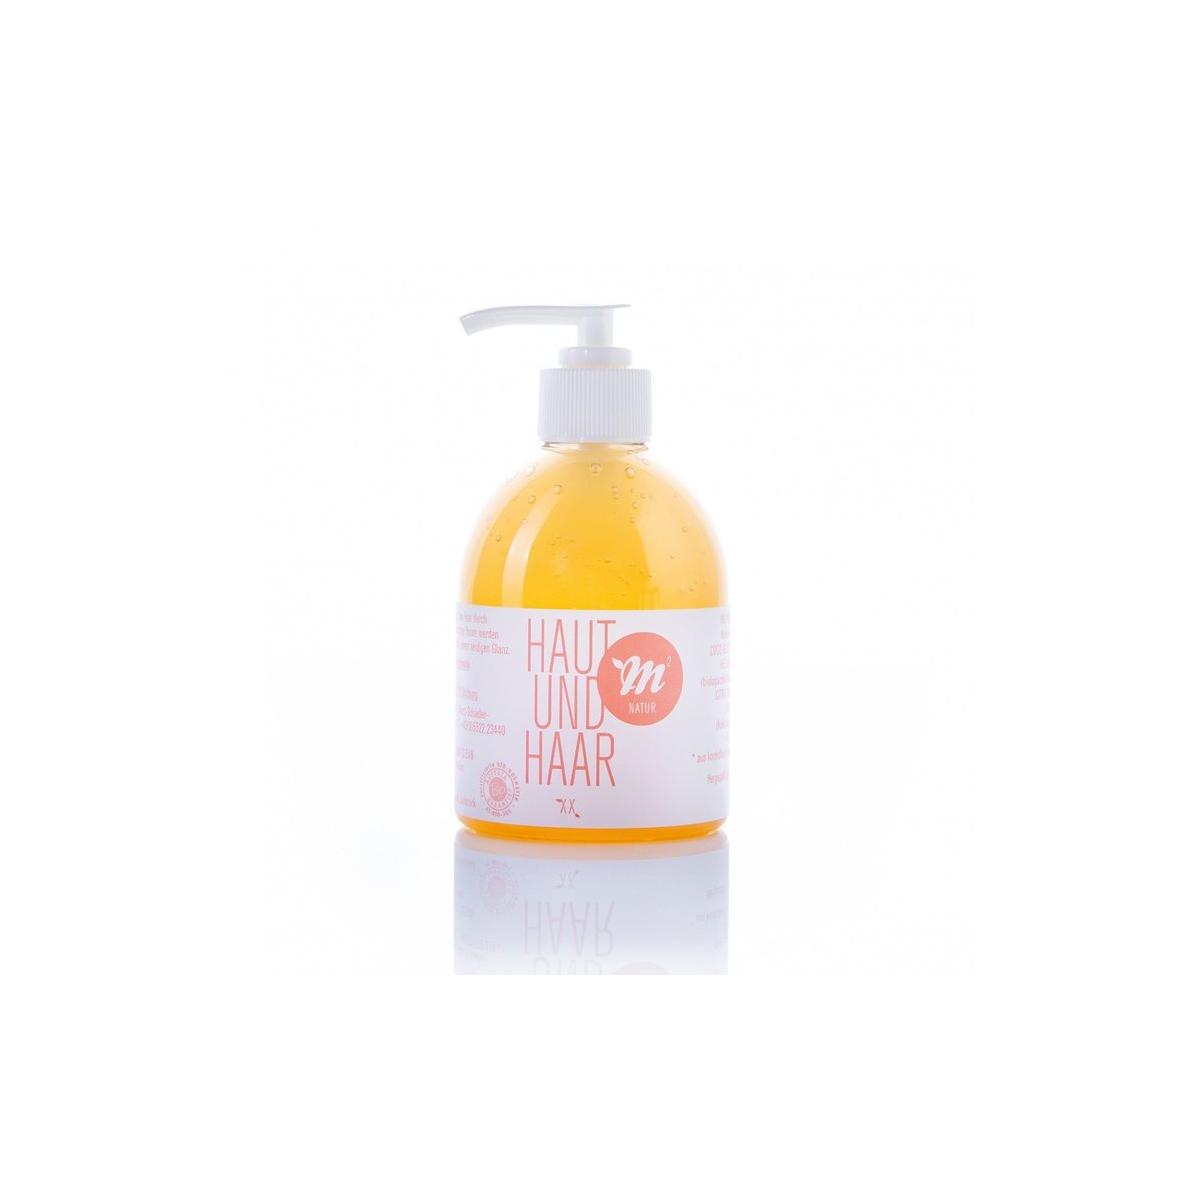 Uni Sapon Haut & Haar feminin Duschpflege 250ml